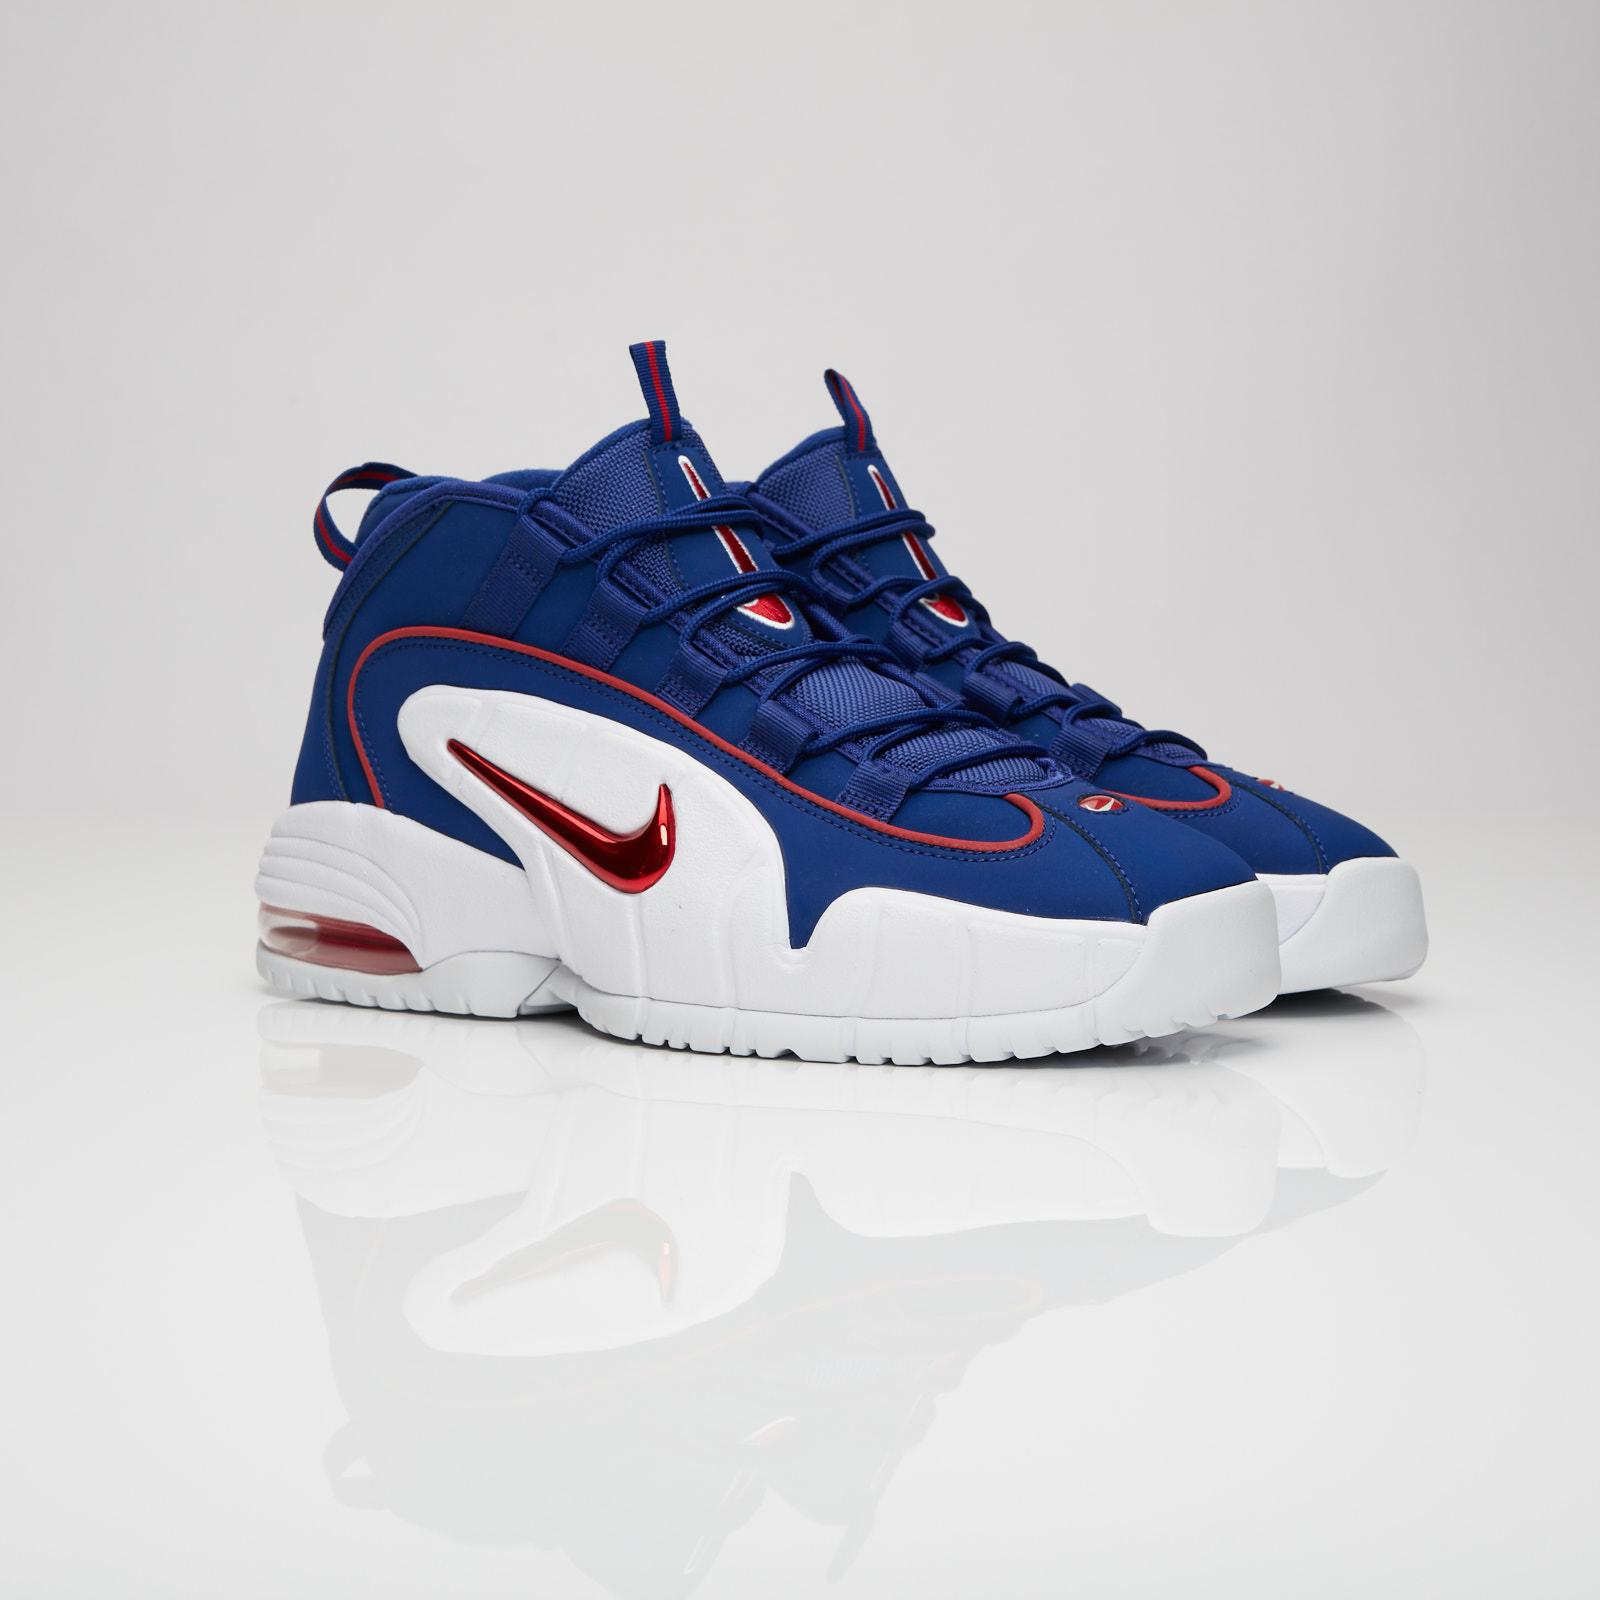 new product 9cb1b b3713 Nike Sportswear Air Max Penny